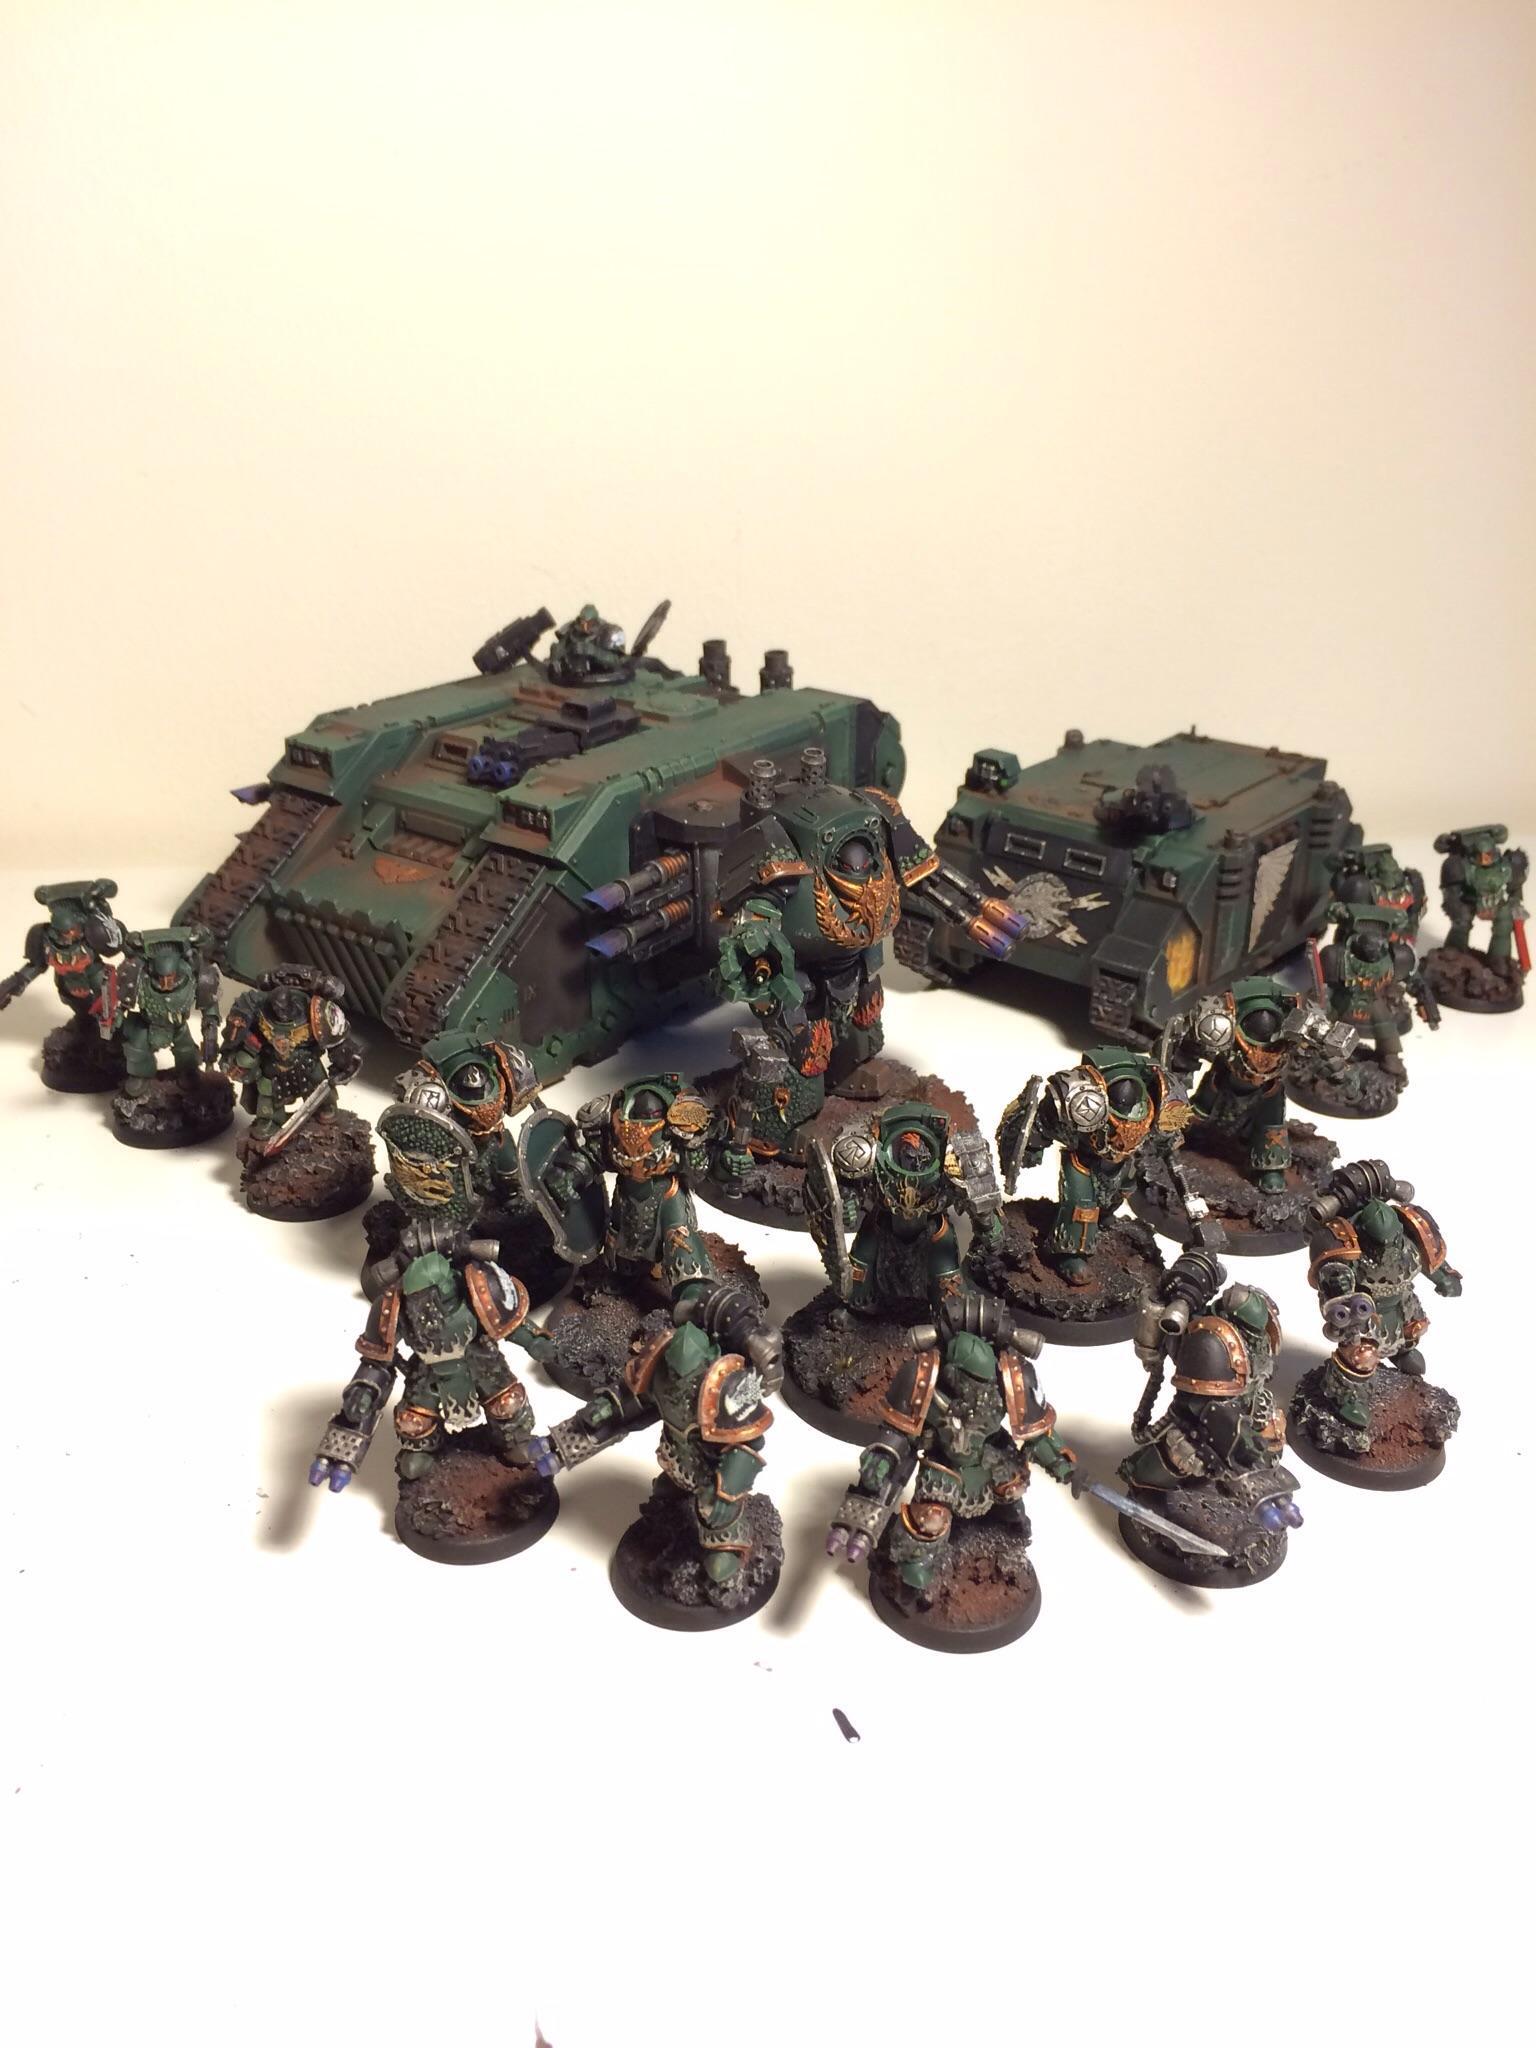 Firedrakes, Forge World, Horus Heresy, Primarch, Pyroclasts, Salamanders, Vulkan, Warhammer 40,000